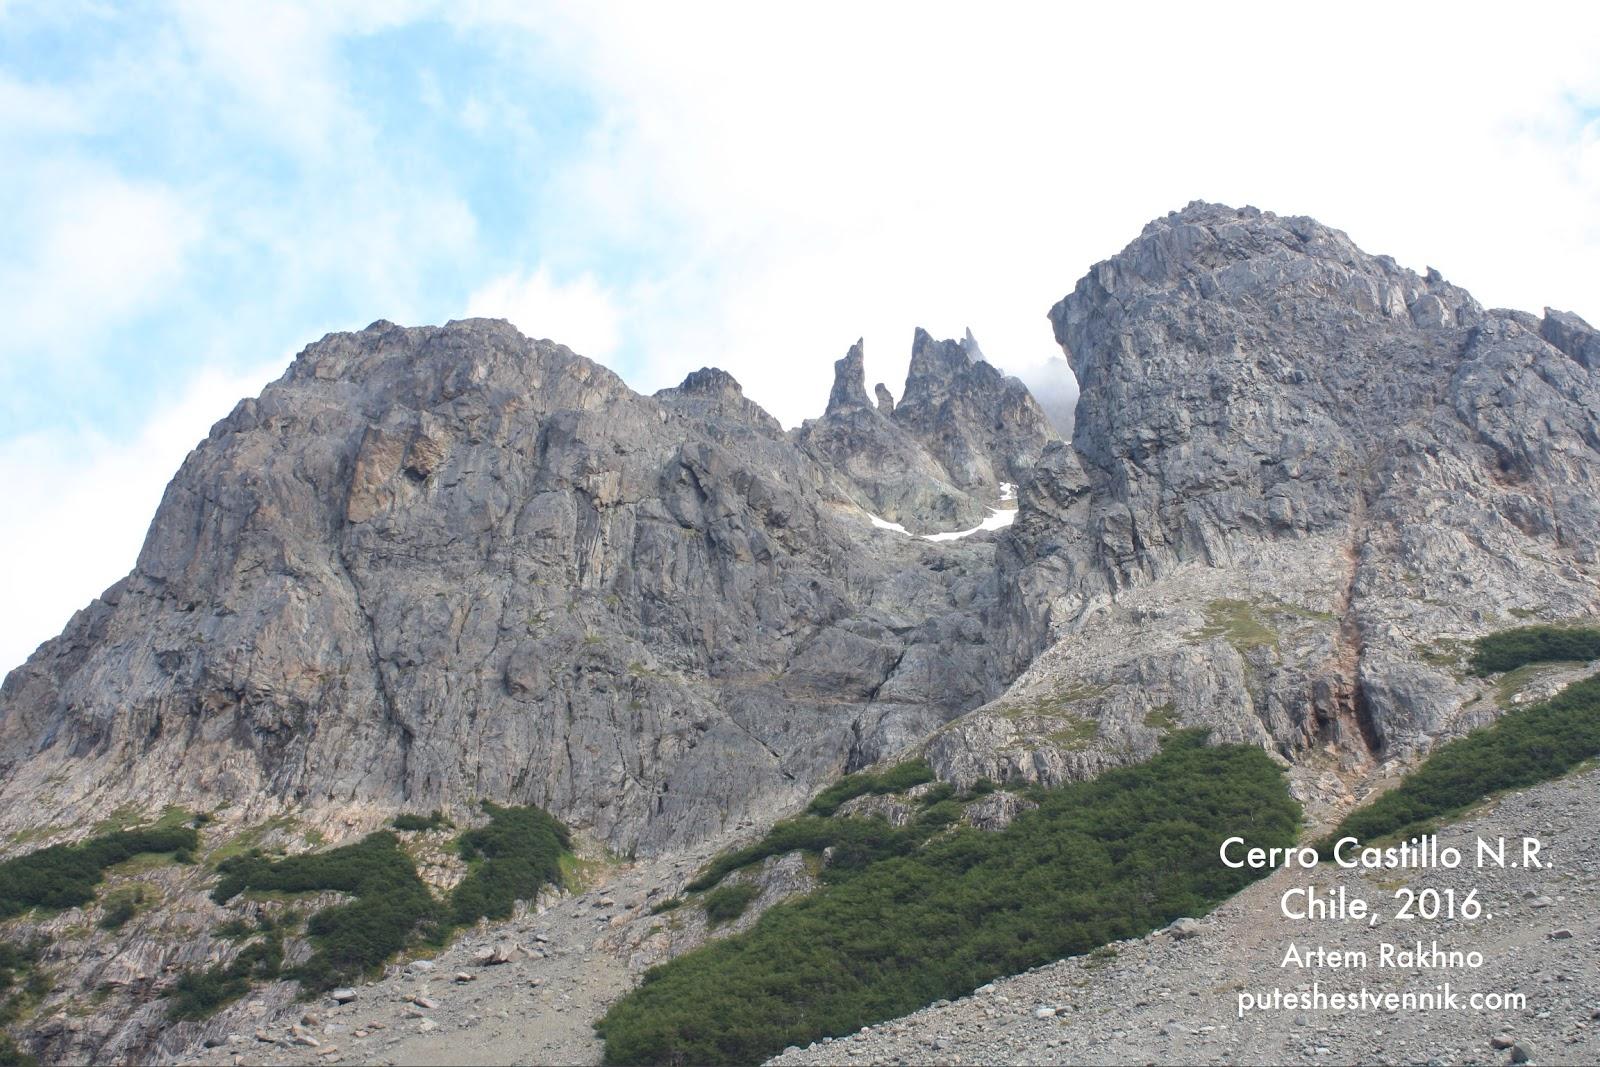 Путешествие по Reserva Nacional Cerro Castillo